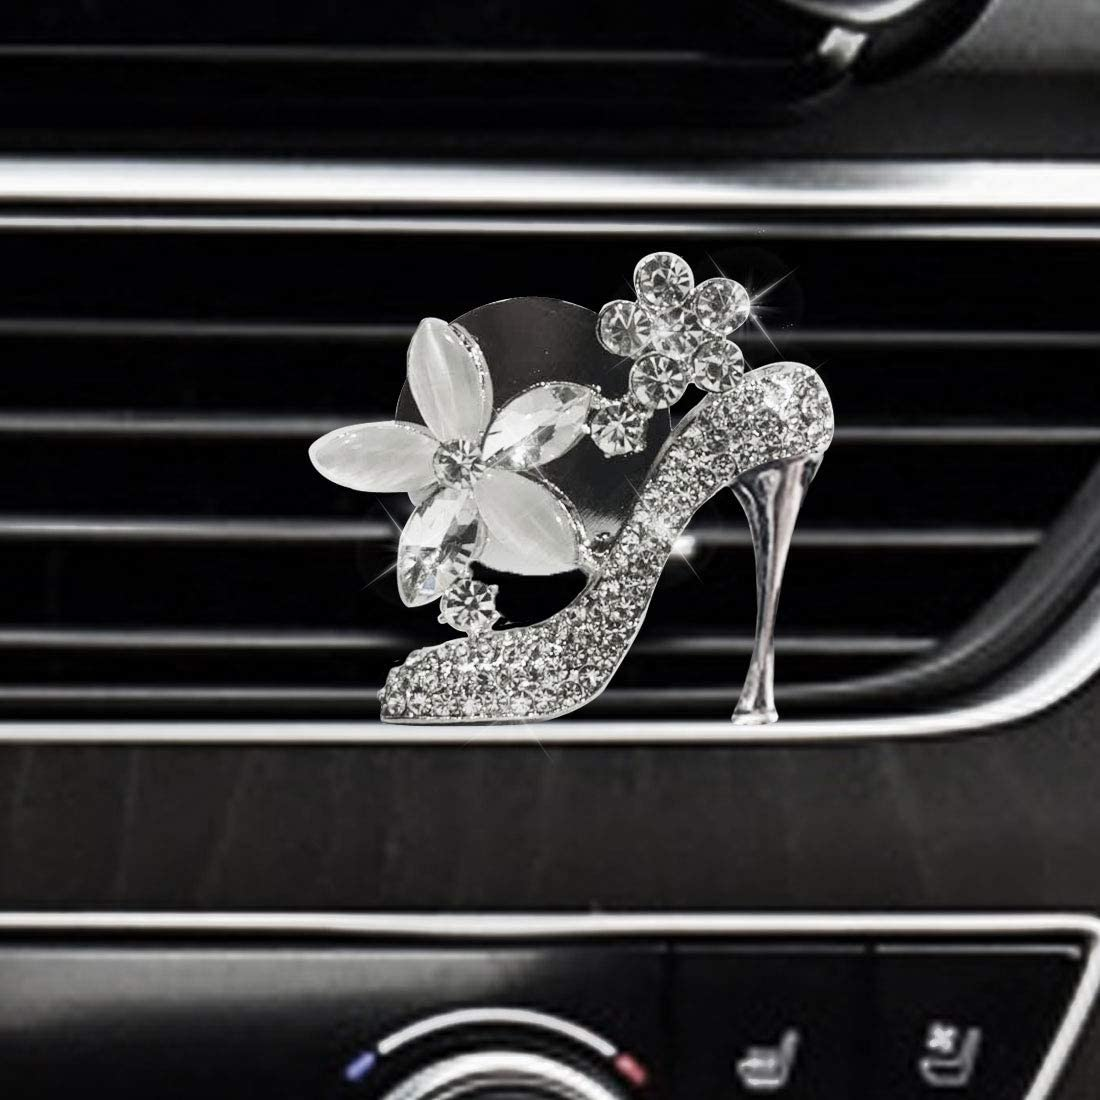 JALII High Heel Shoe Car Air Vent Clip Charm, Bling Car Accessories, Crystal Women Fashion Shoe w/Flowers, Car Interior Decoration Charm, Rhinestone Car Bling Accessories, Cute Car Decor